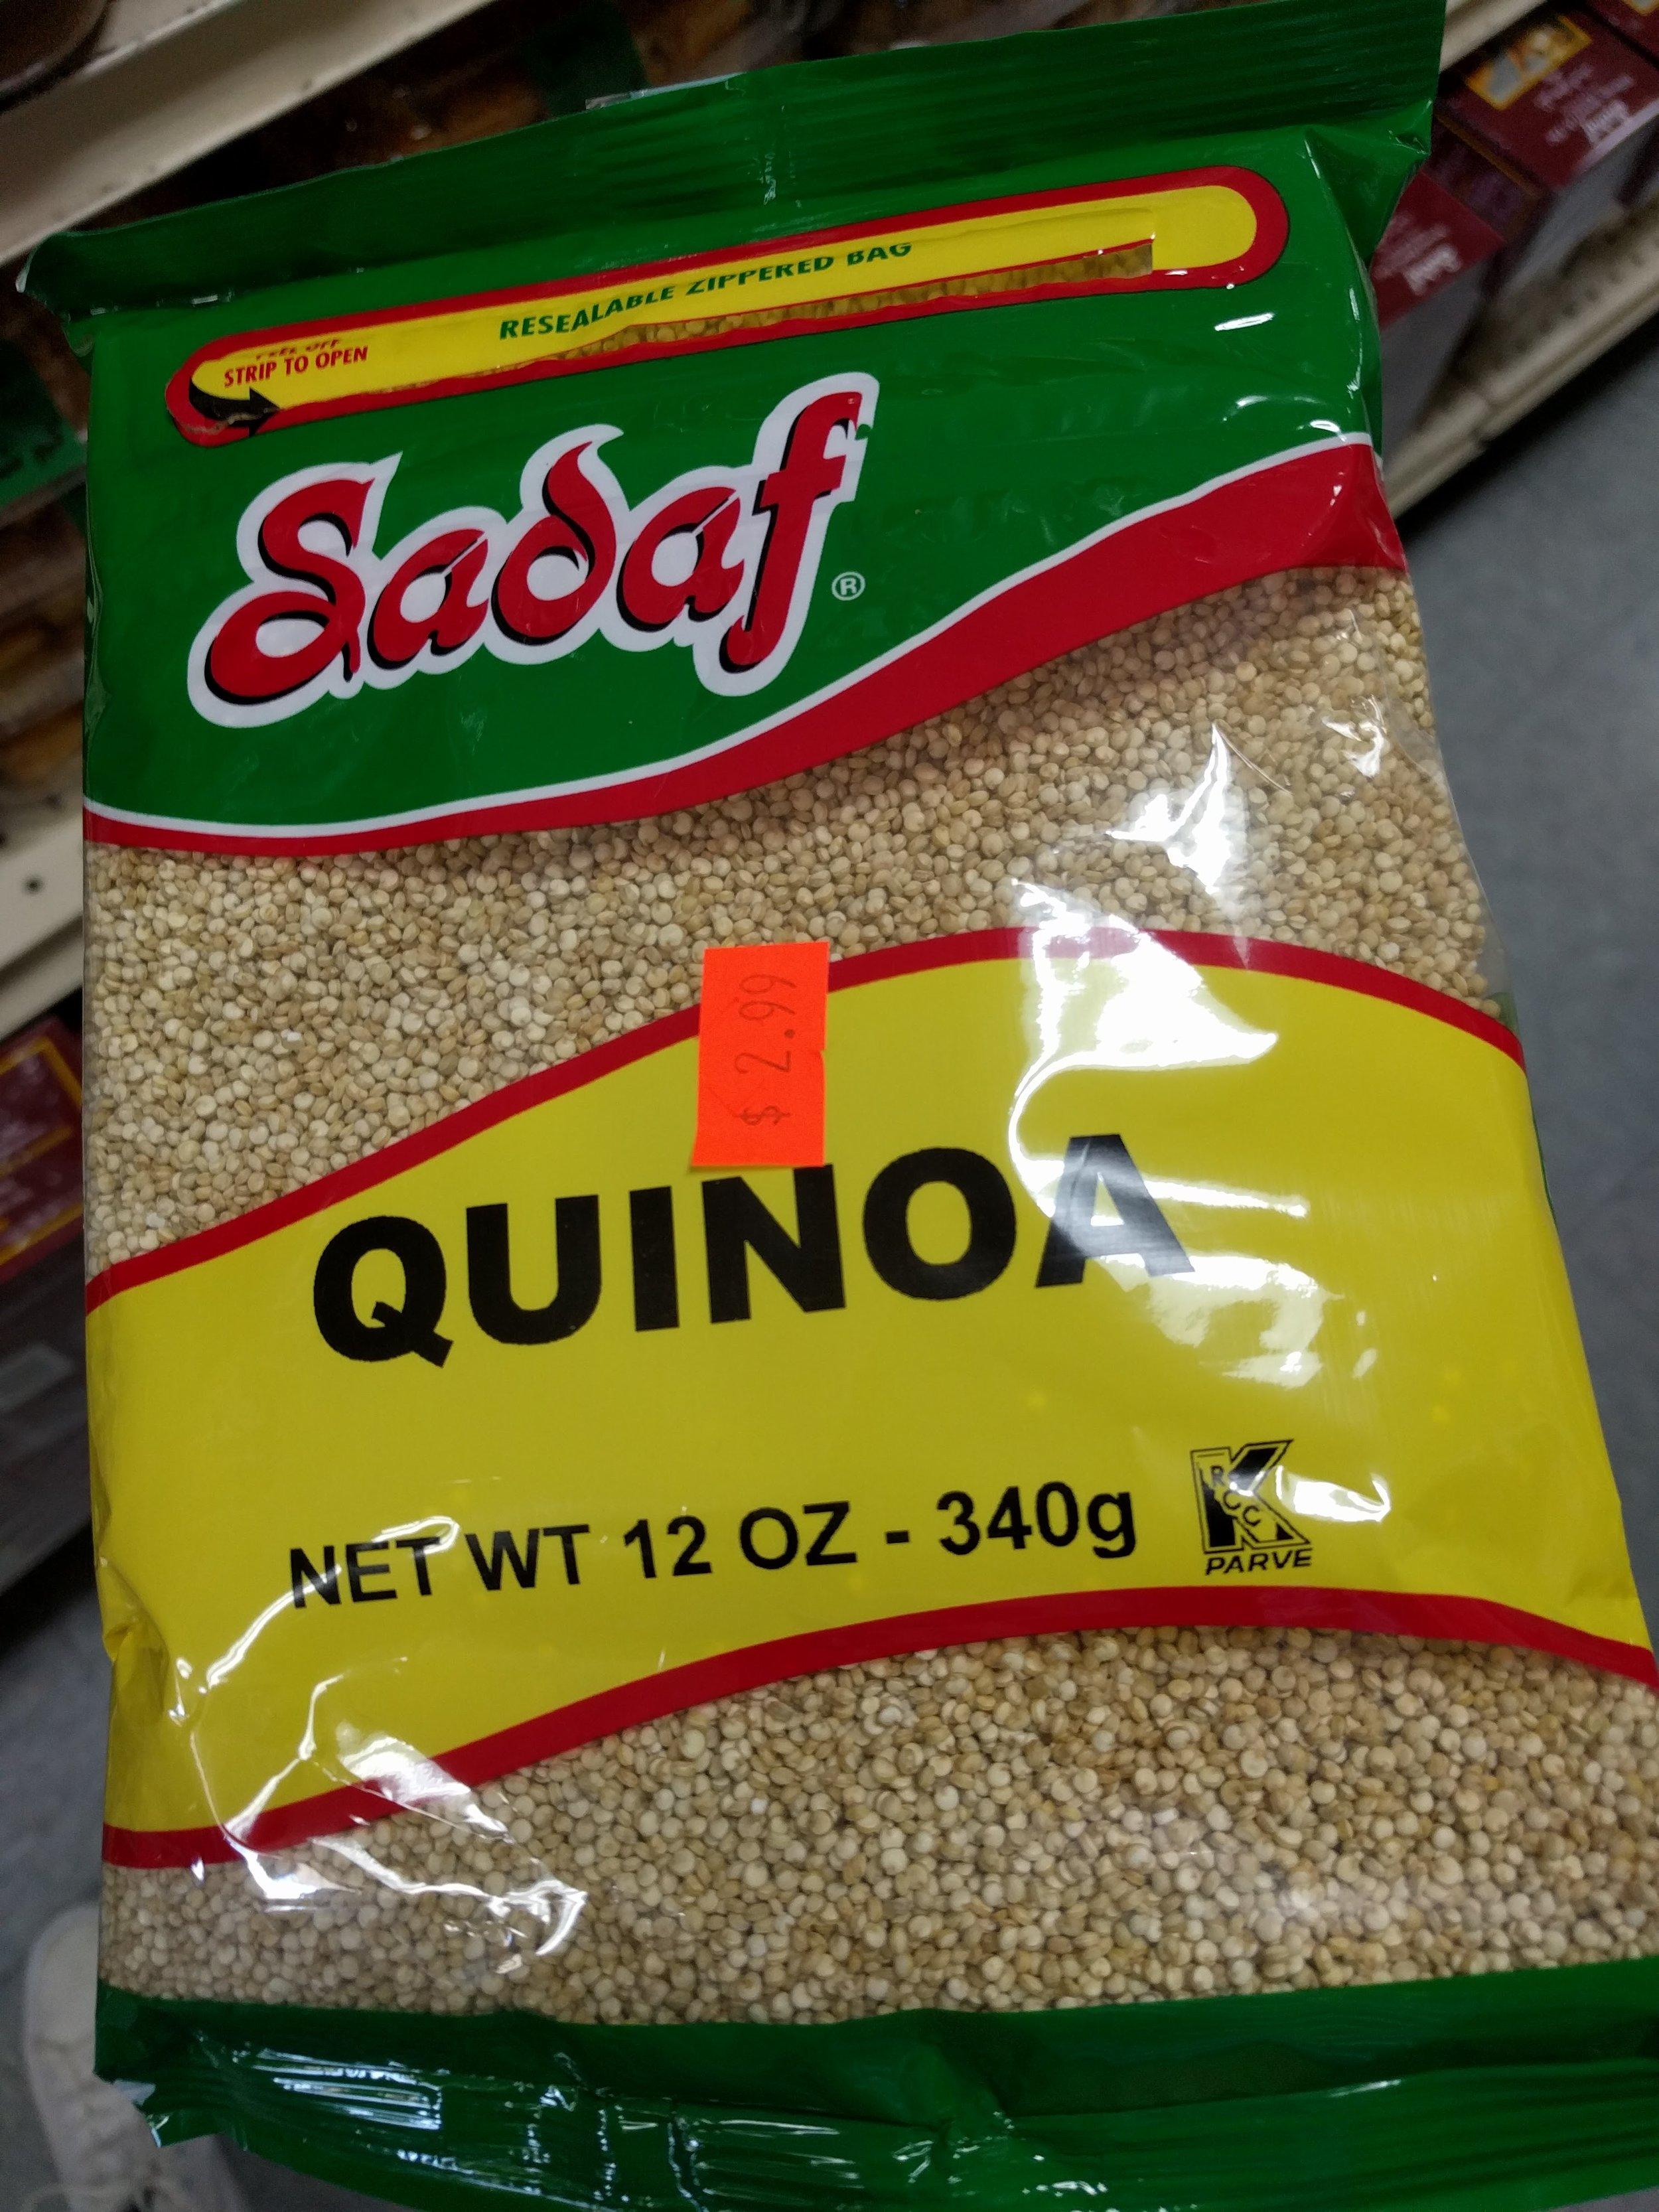 Quinoa-Pak-Halal-International-Foods-12259-W-87th-St-Pkwy-Lenexa-KS-66215.jpg